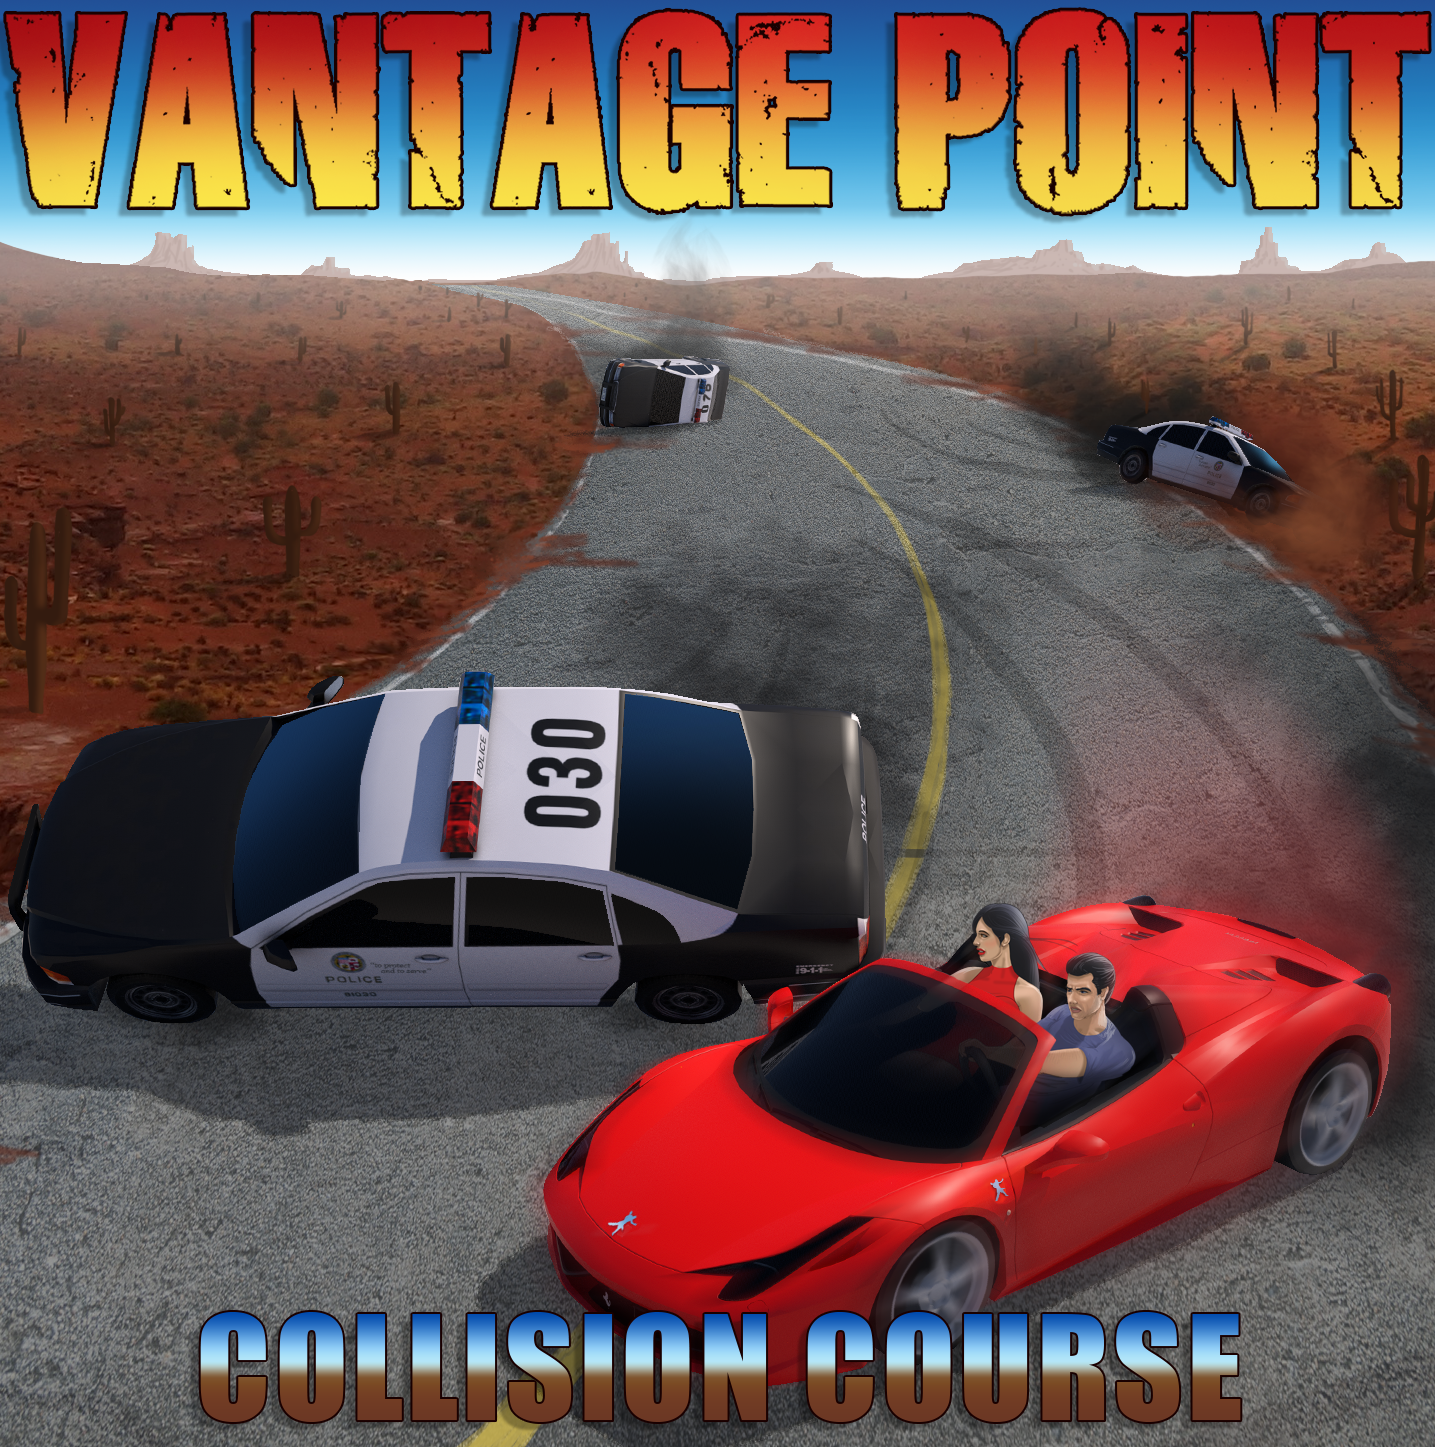 VANTAGE POINT - Collision Course cover